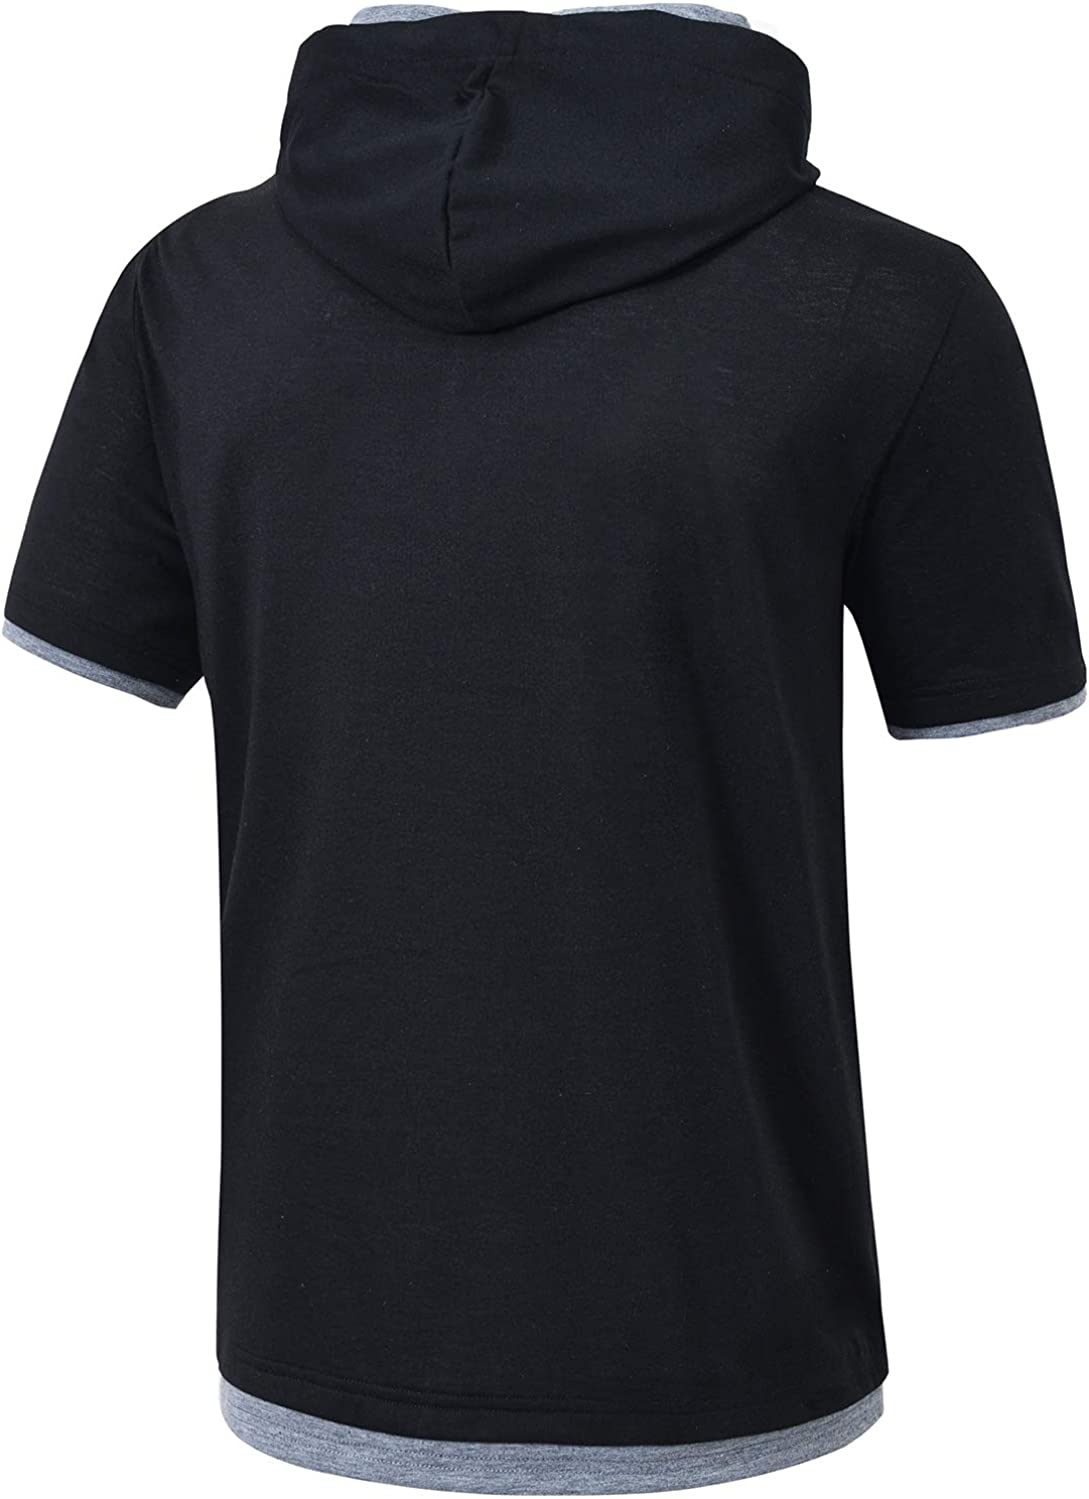 Satankud Men's Casual Short Sleeve Pullover Hoodie Shirt